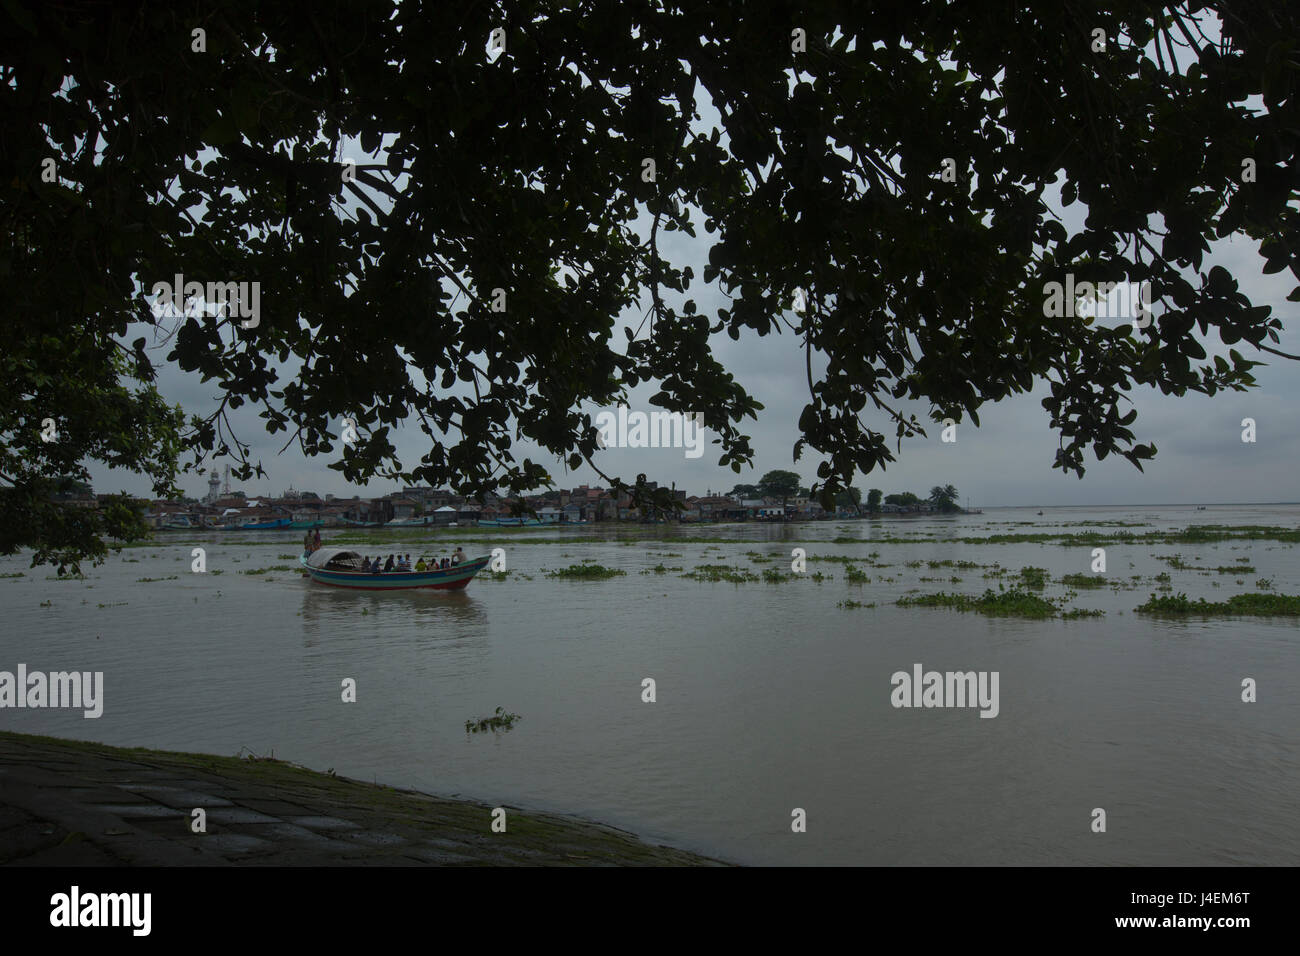 View of the Dakatia River in Chandpur, Bangladesh. - Stock Image